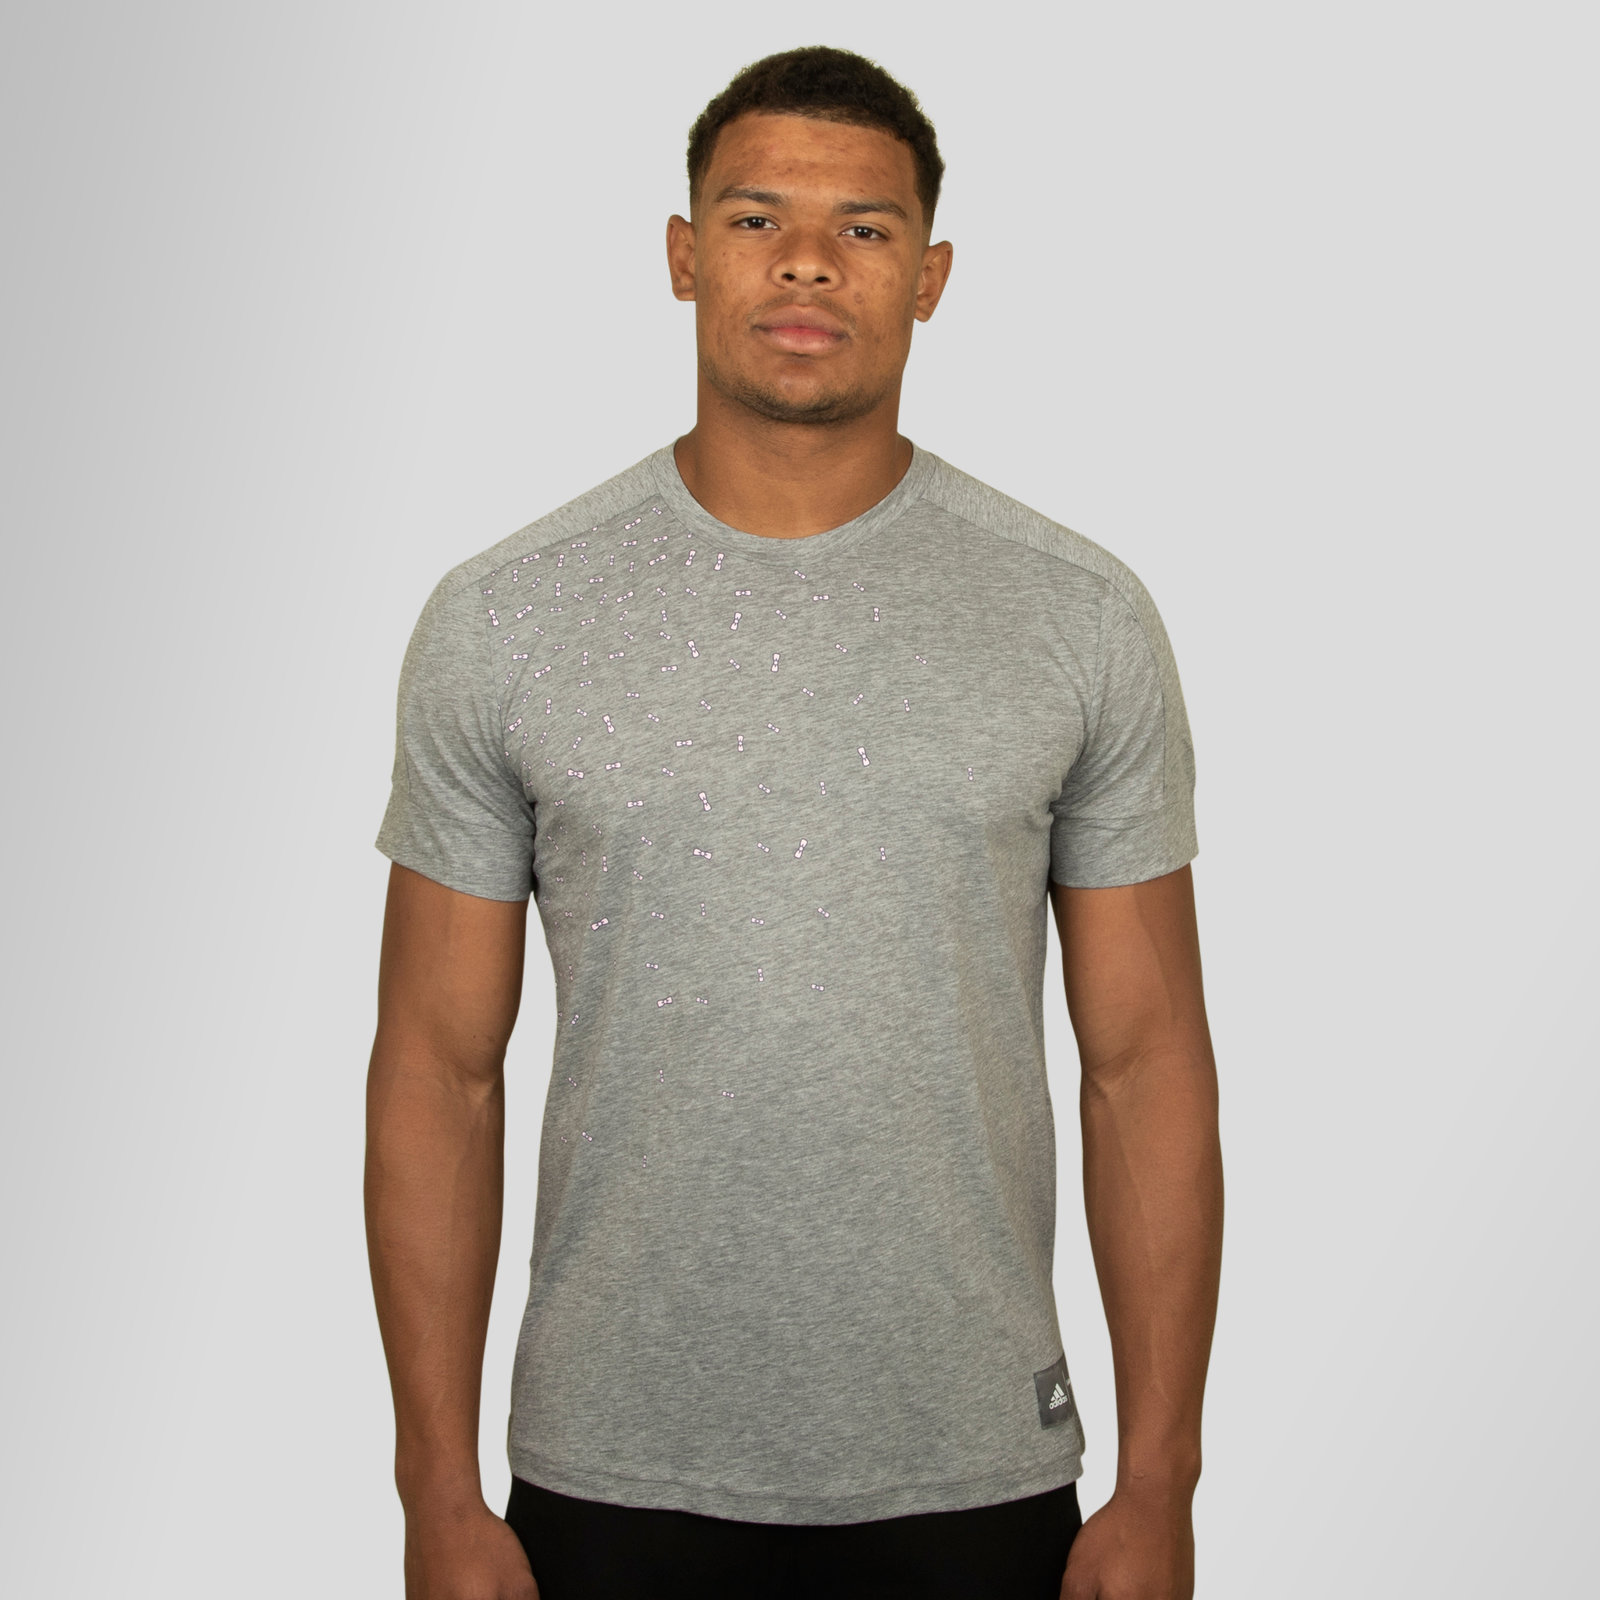 Details zu adidas Mens Eden Park Rugby Training T Shirt Grey Activewear Sports Pants